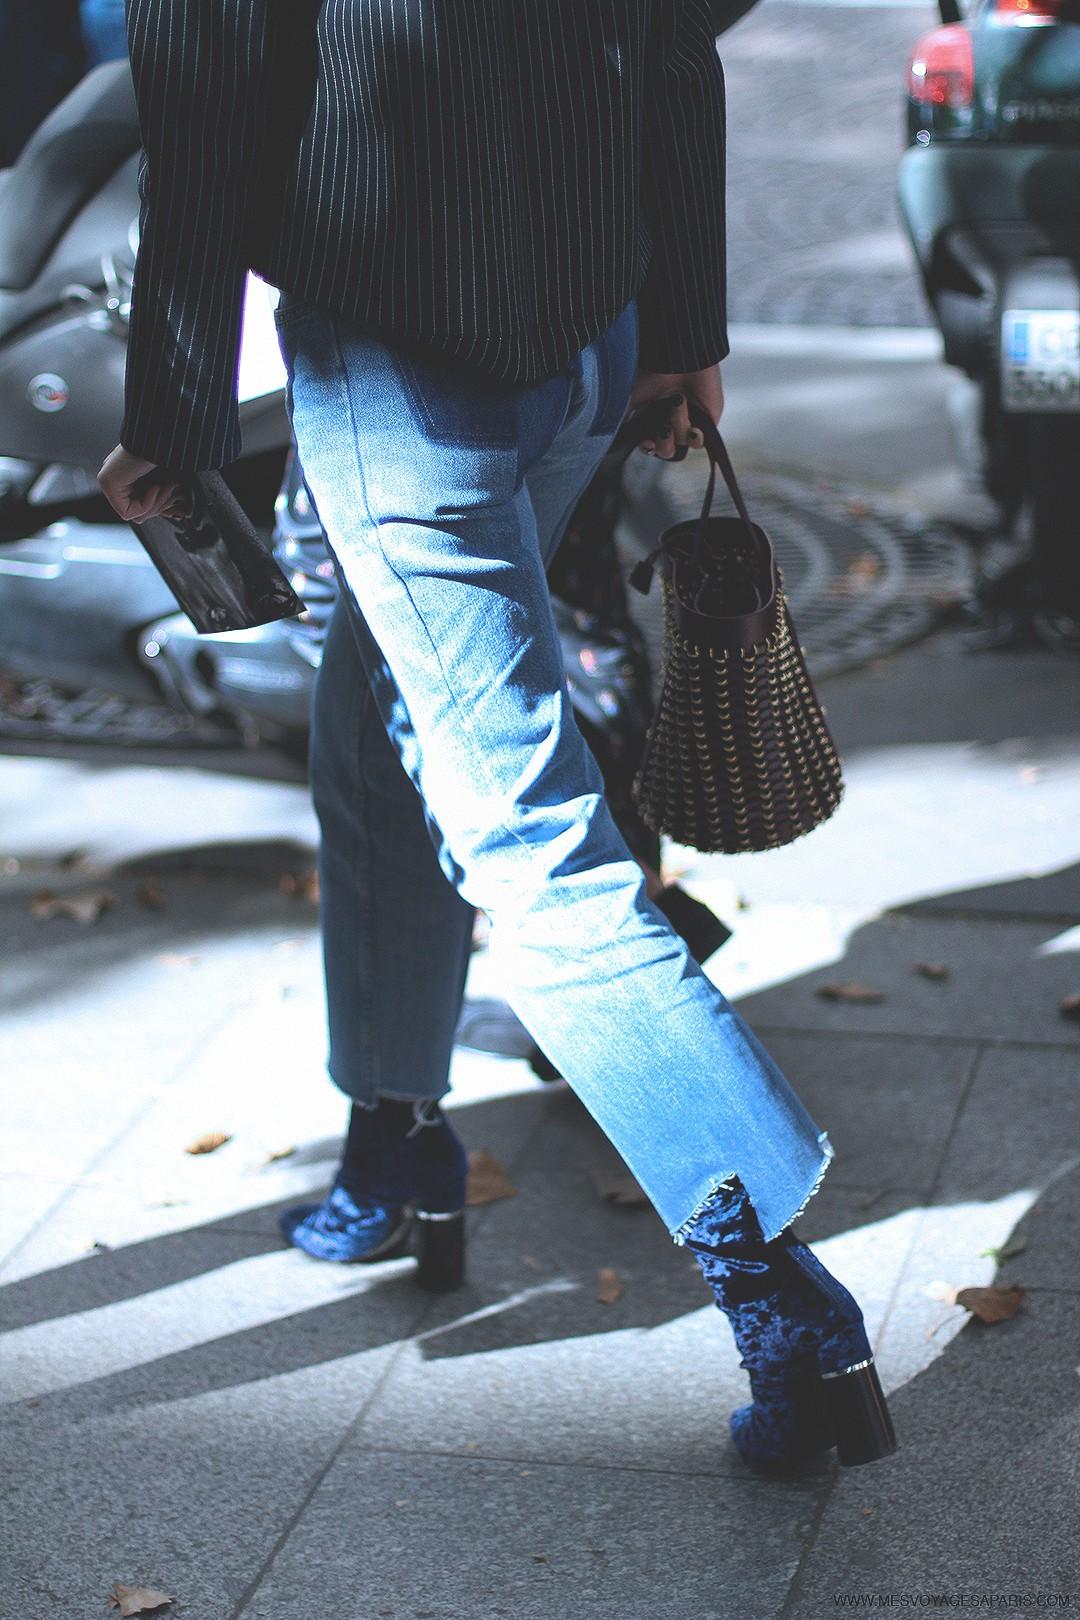 street-style-pfw-september-2016-def-mesvoyagesaparispfw-street-style-september-2016-fashion-blogimg_7998-copia